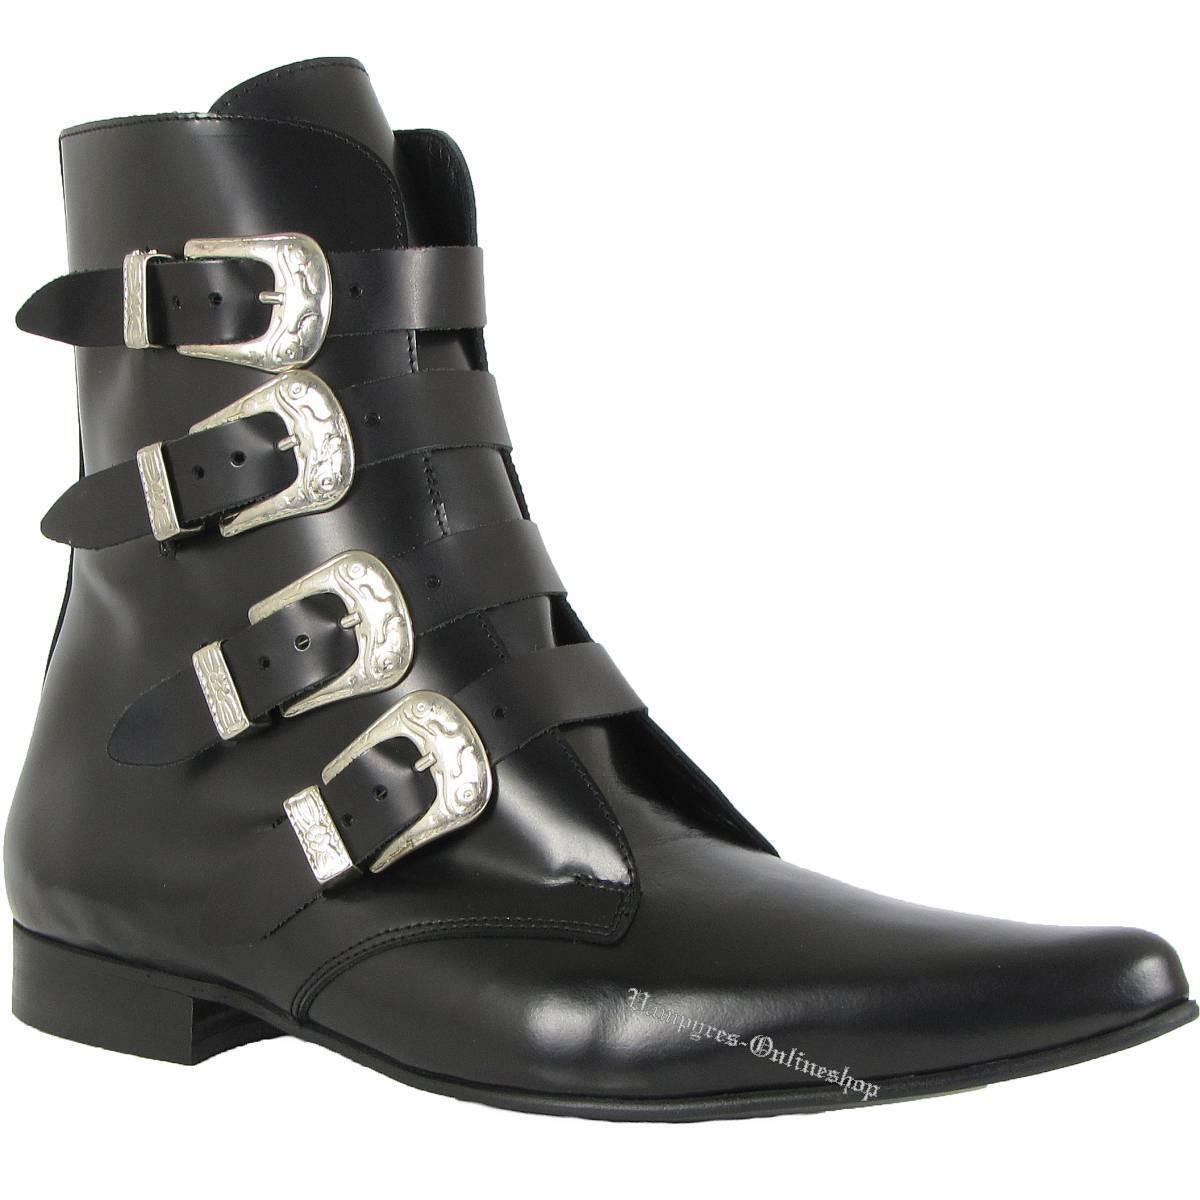 botas & Braces 4 hebillas winkelpiker negro botas and Pikes Pikes Pikes cuero negro negro  sin mínimo